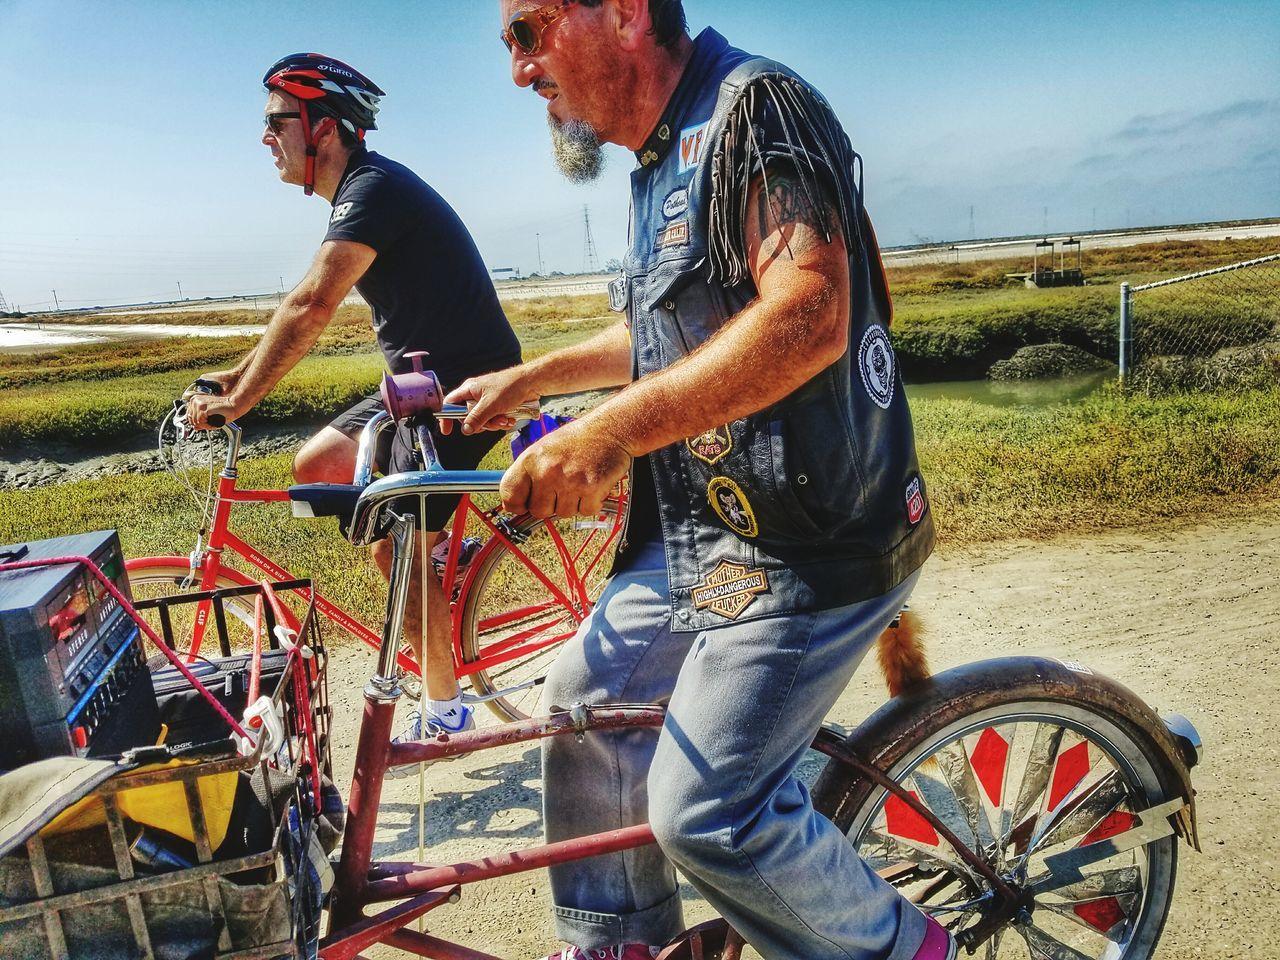 Beautiful stock photos of straßenfotografie, bicycle, mode of transport, transportation, cycling